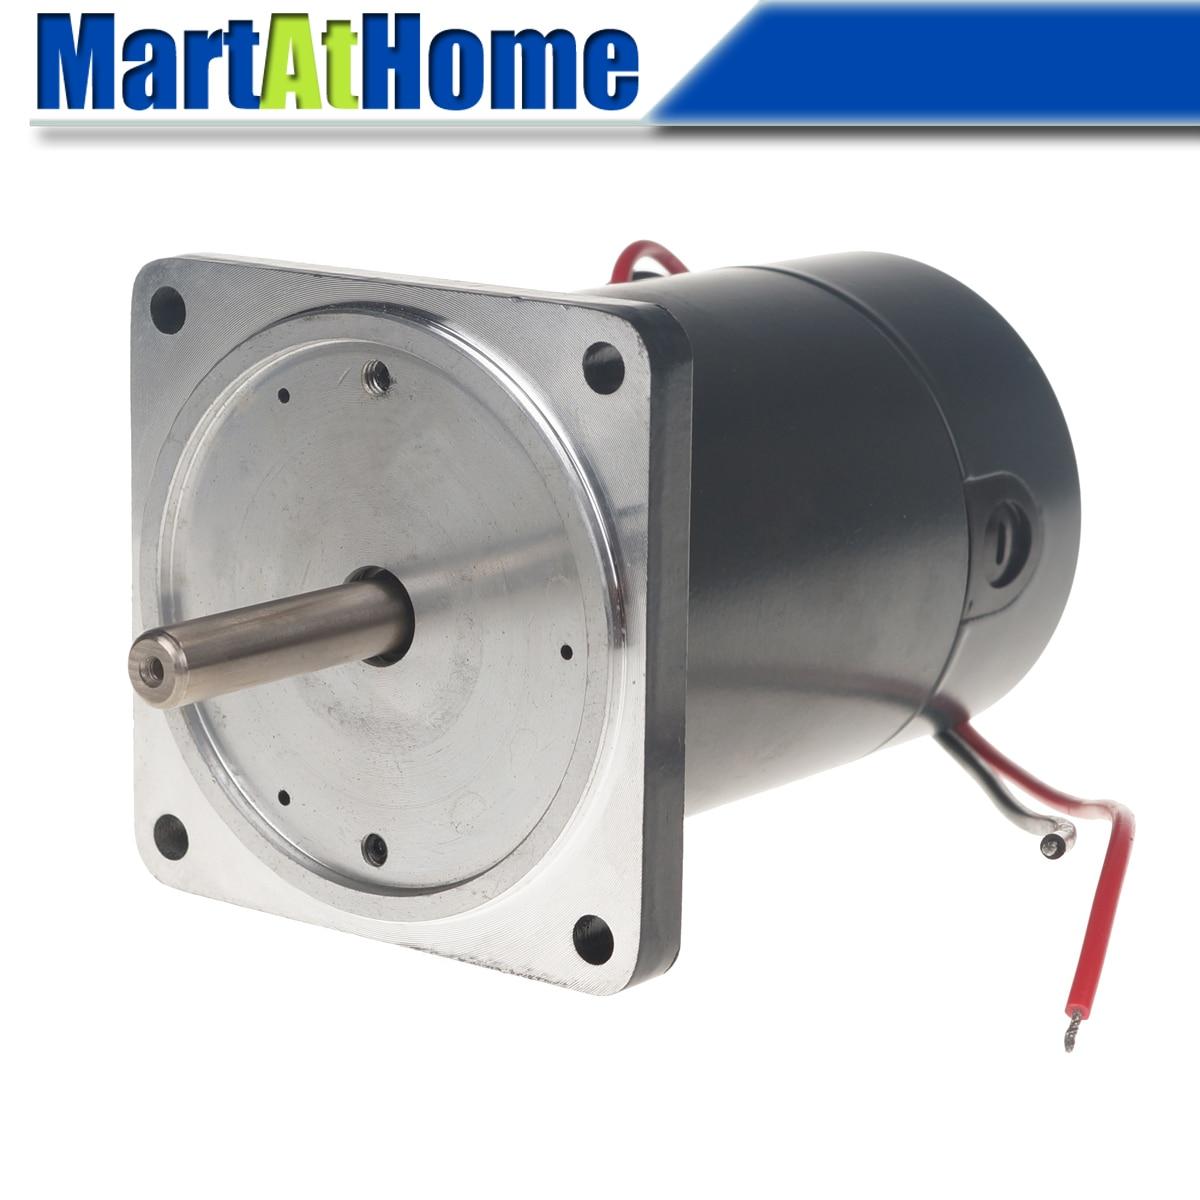 PMDC Brushed Motor DC 12V 24V 2000/3000/4000/5000/6000 RPM can Reverse low noise